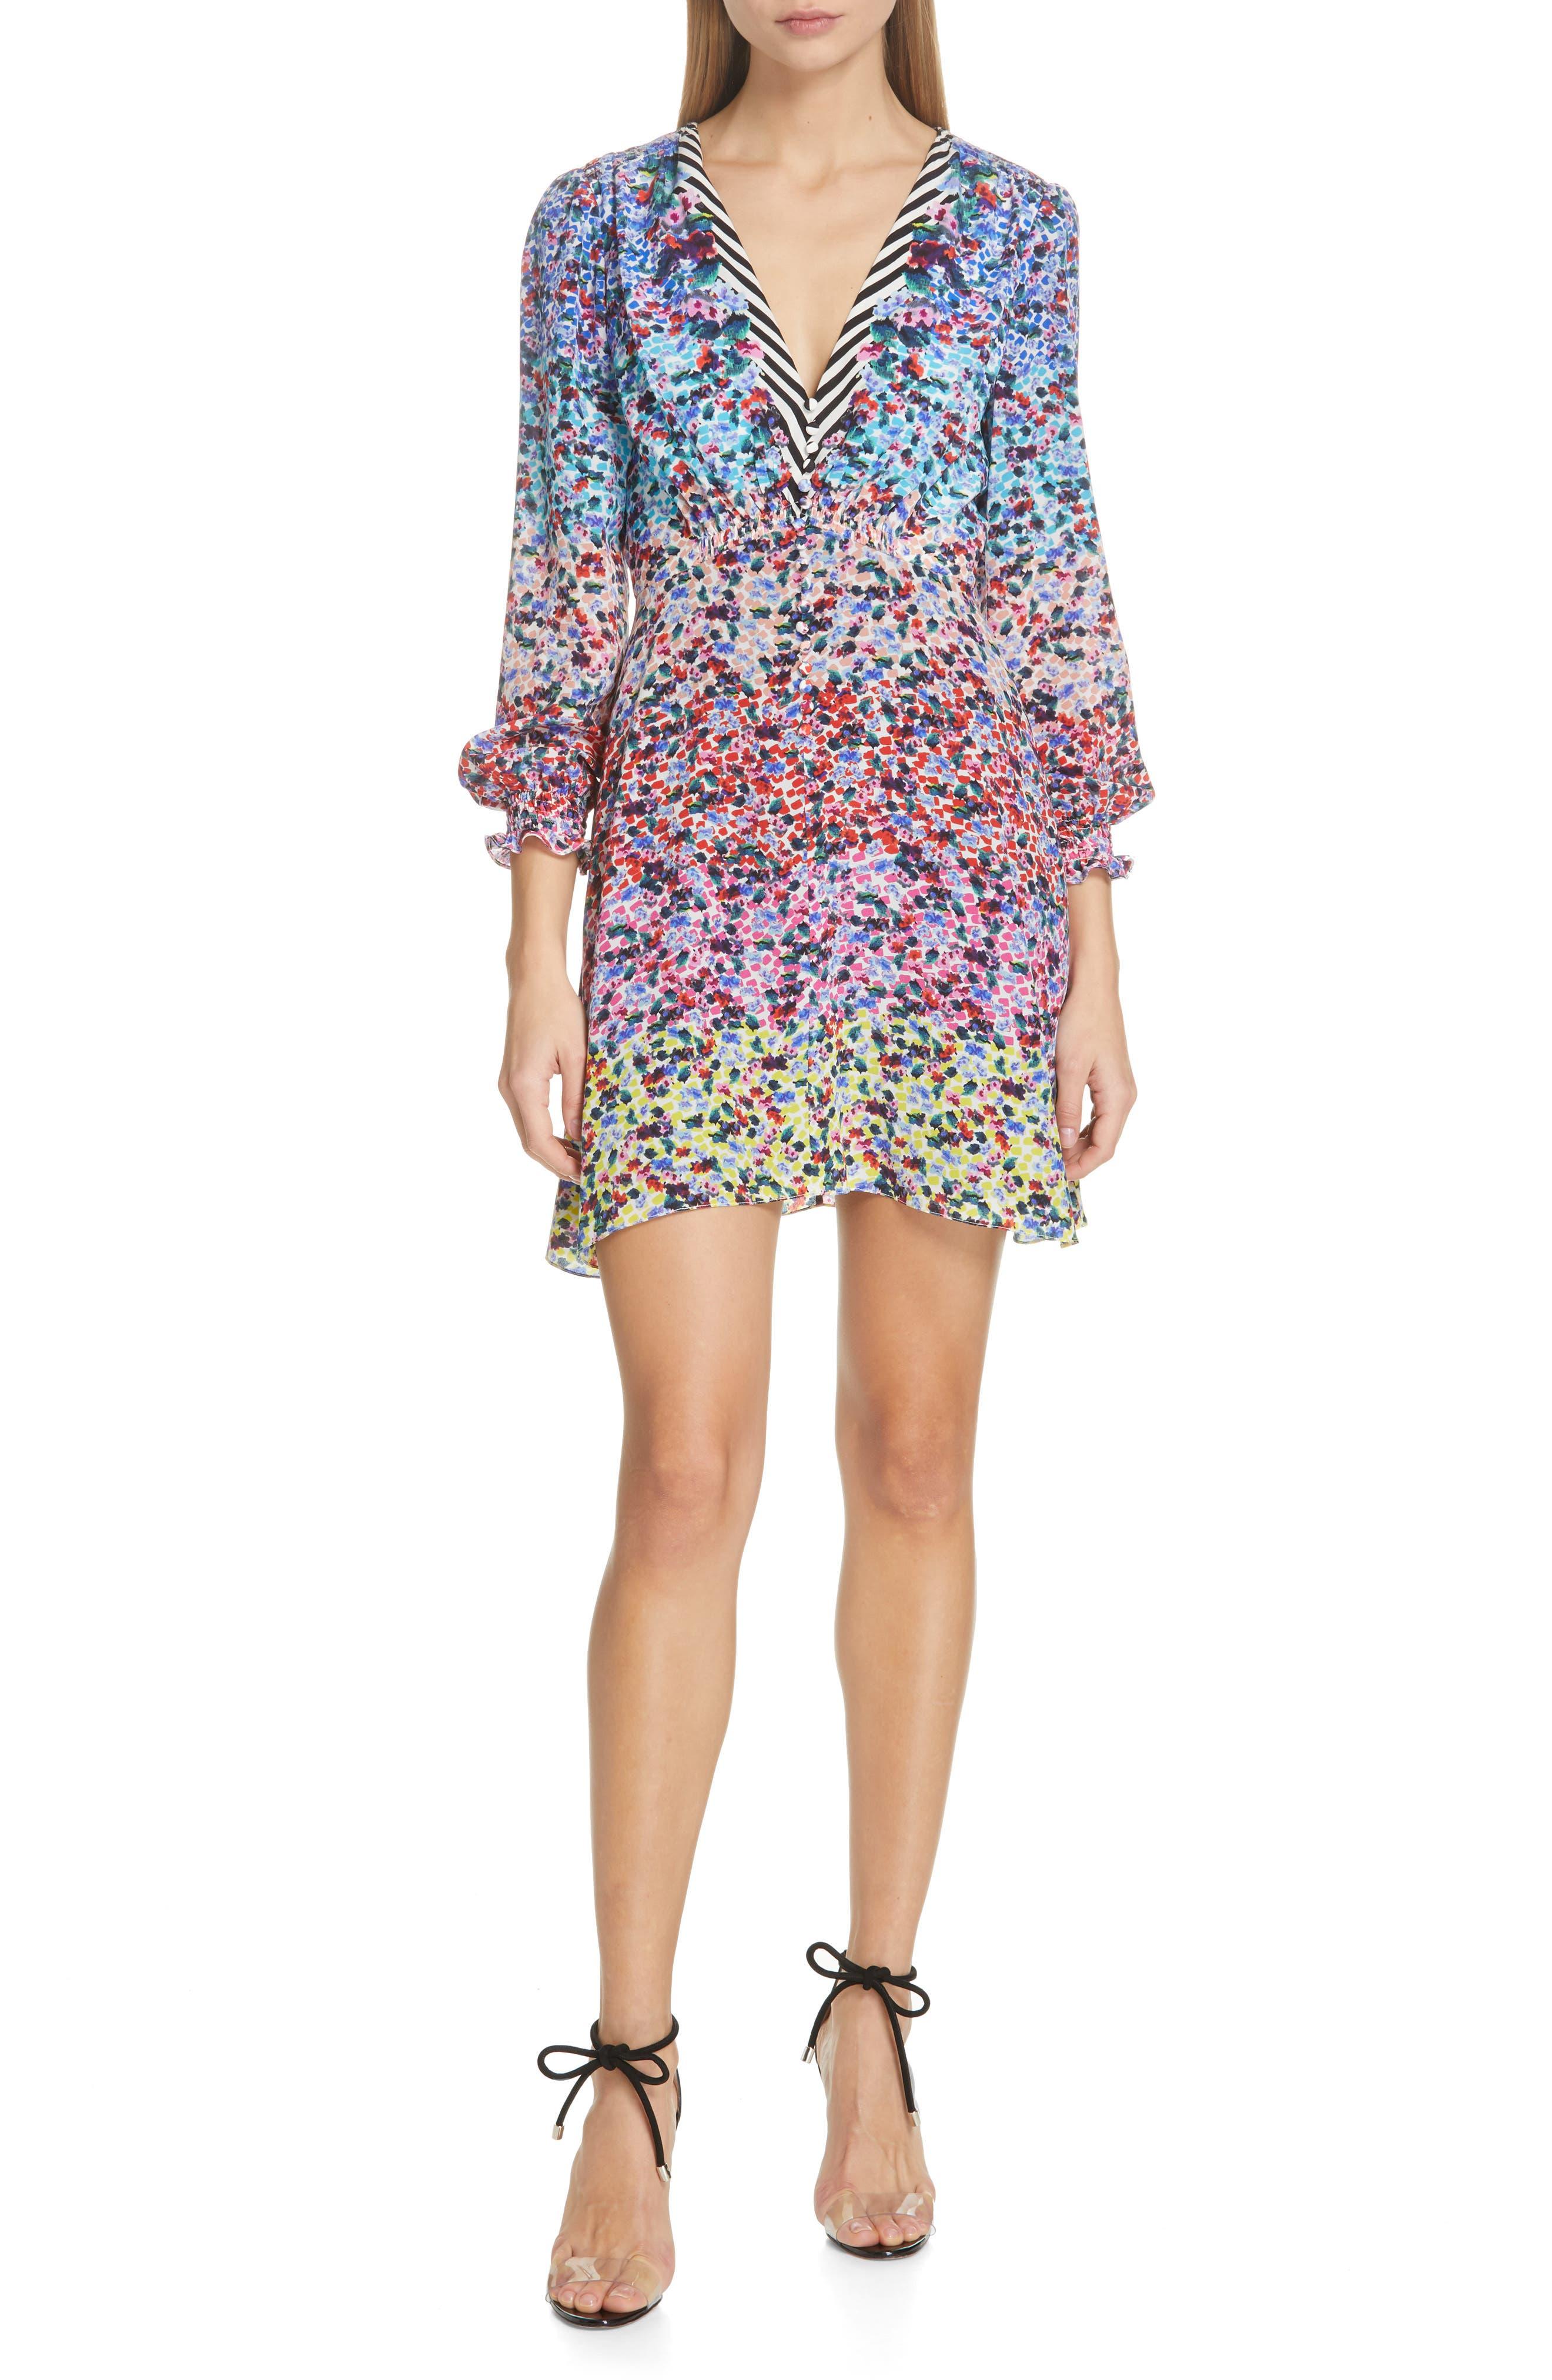 SALONI, Eve Floral Print Dress, Main thumbnail 1, color, RAINBOW GARDENIA PLMT